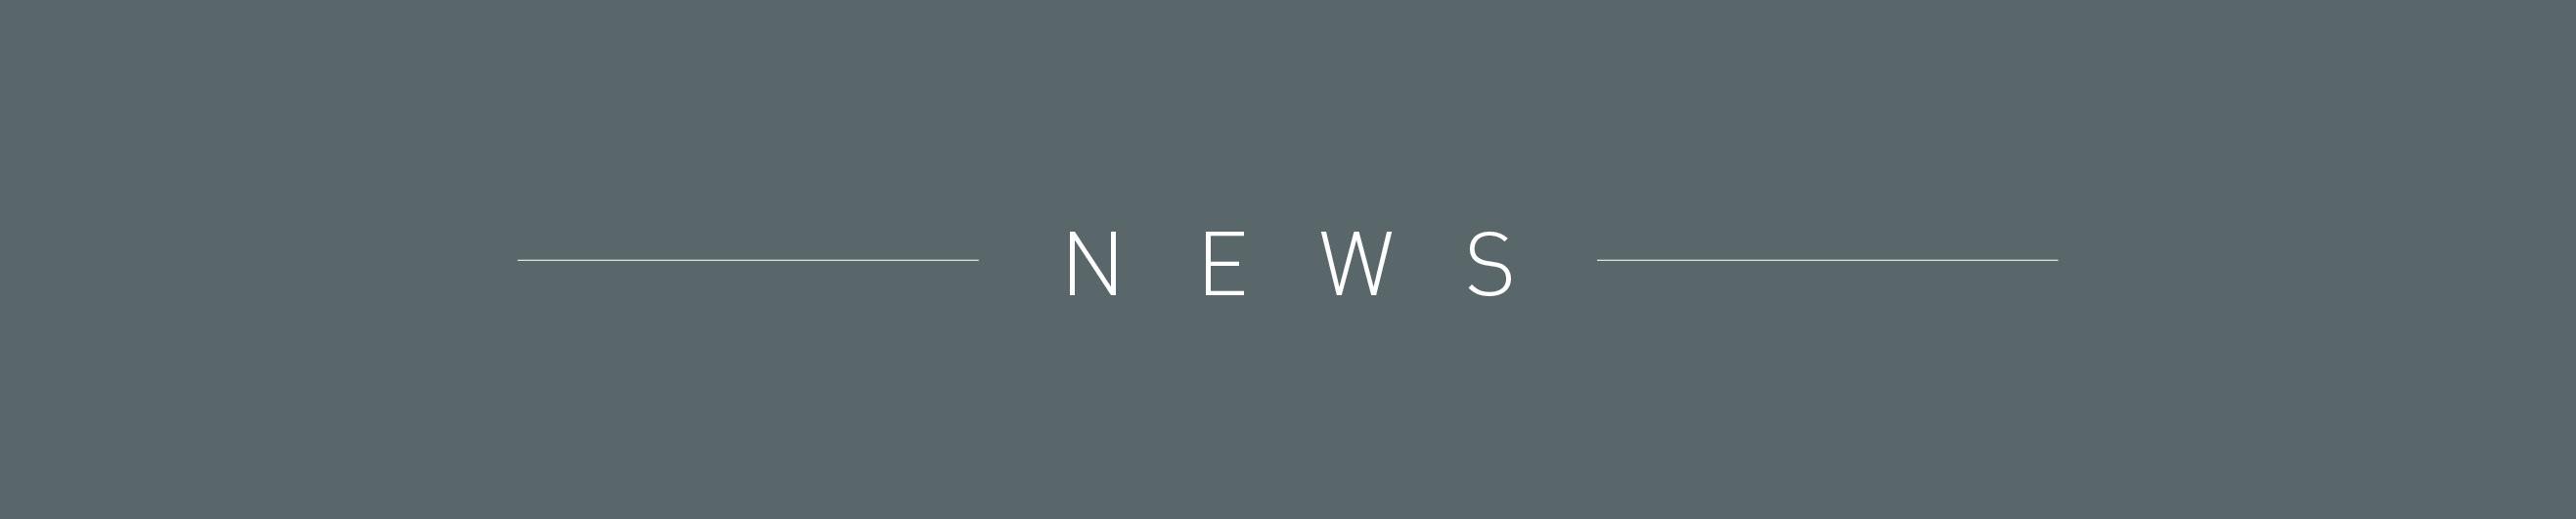 Header_belts_Cycled_news